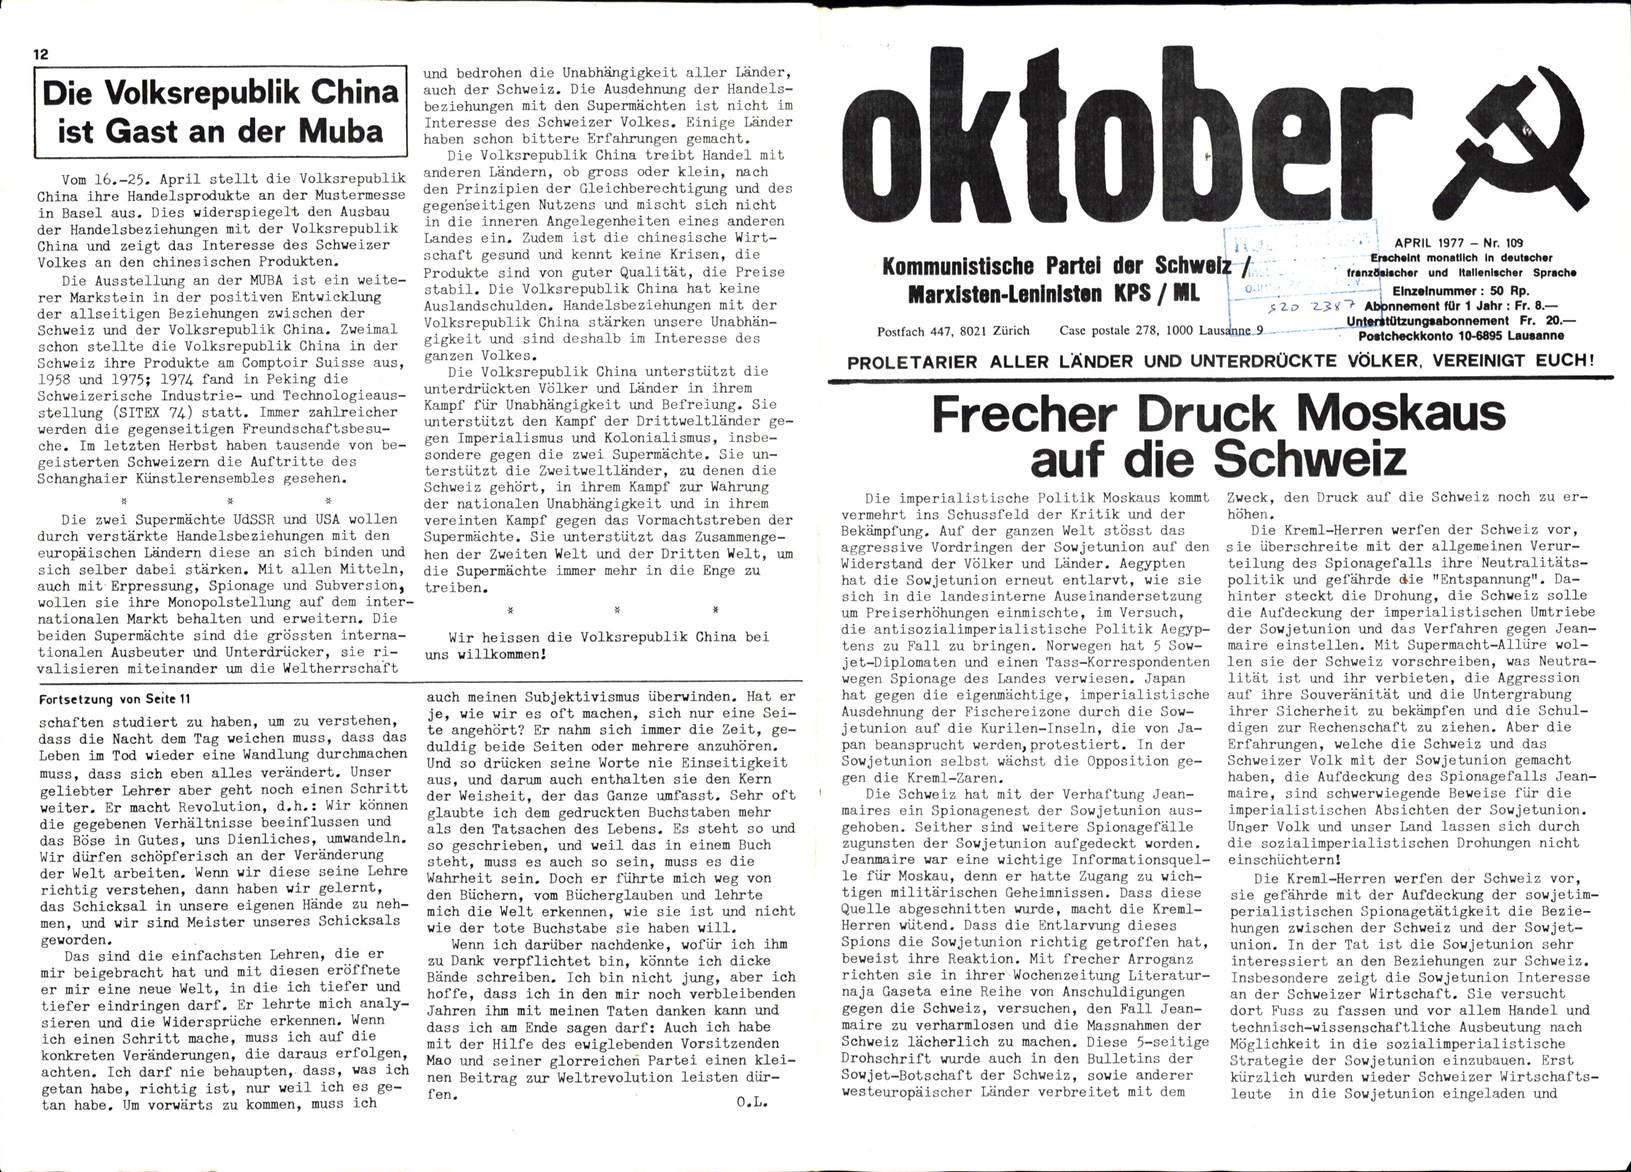 Schweiz_KPSML_Oktober_19770400_109_001